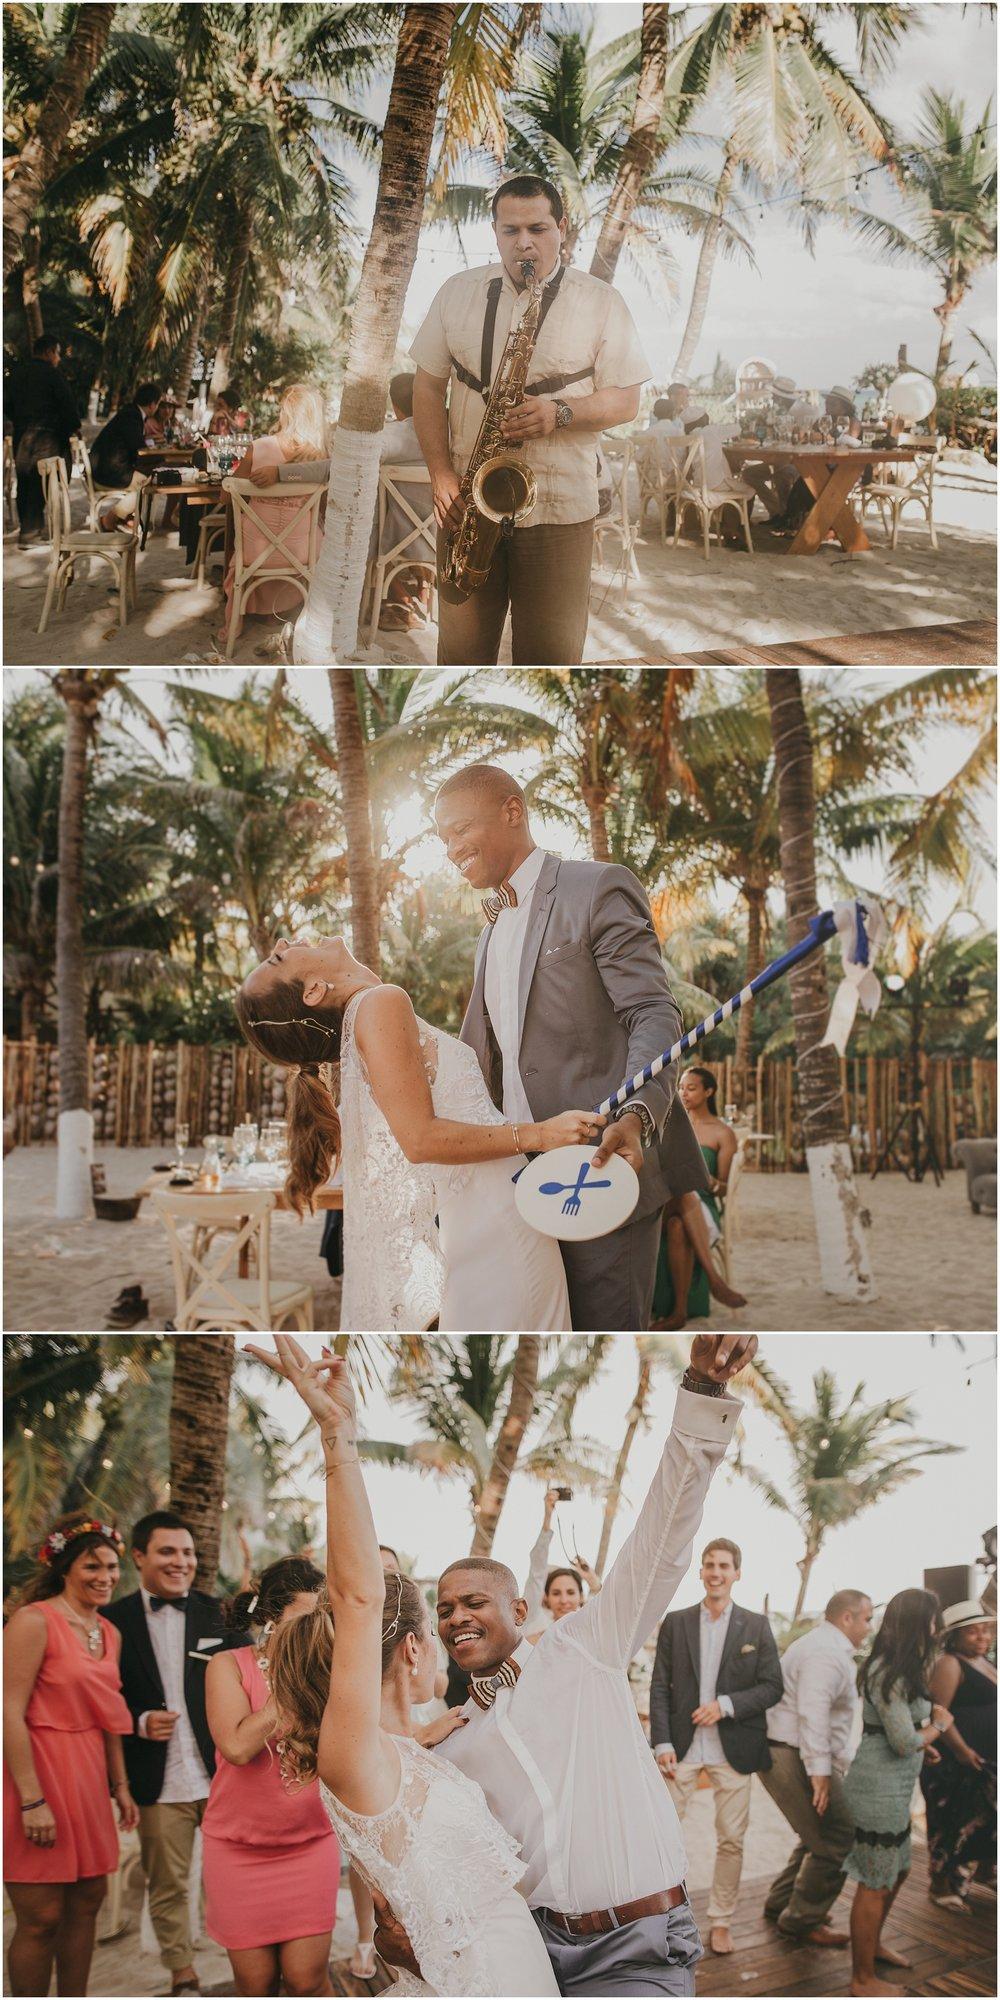 Pablo Laguia wedding photographer 101.jpg